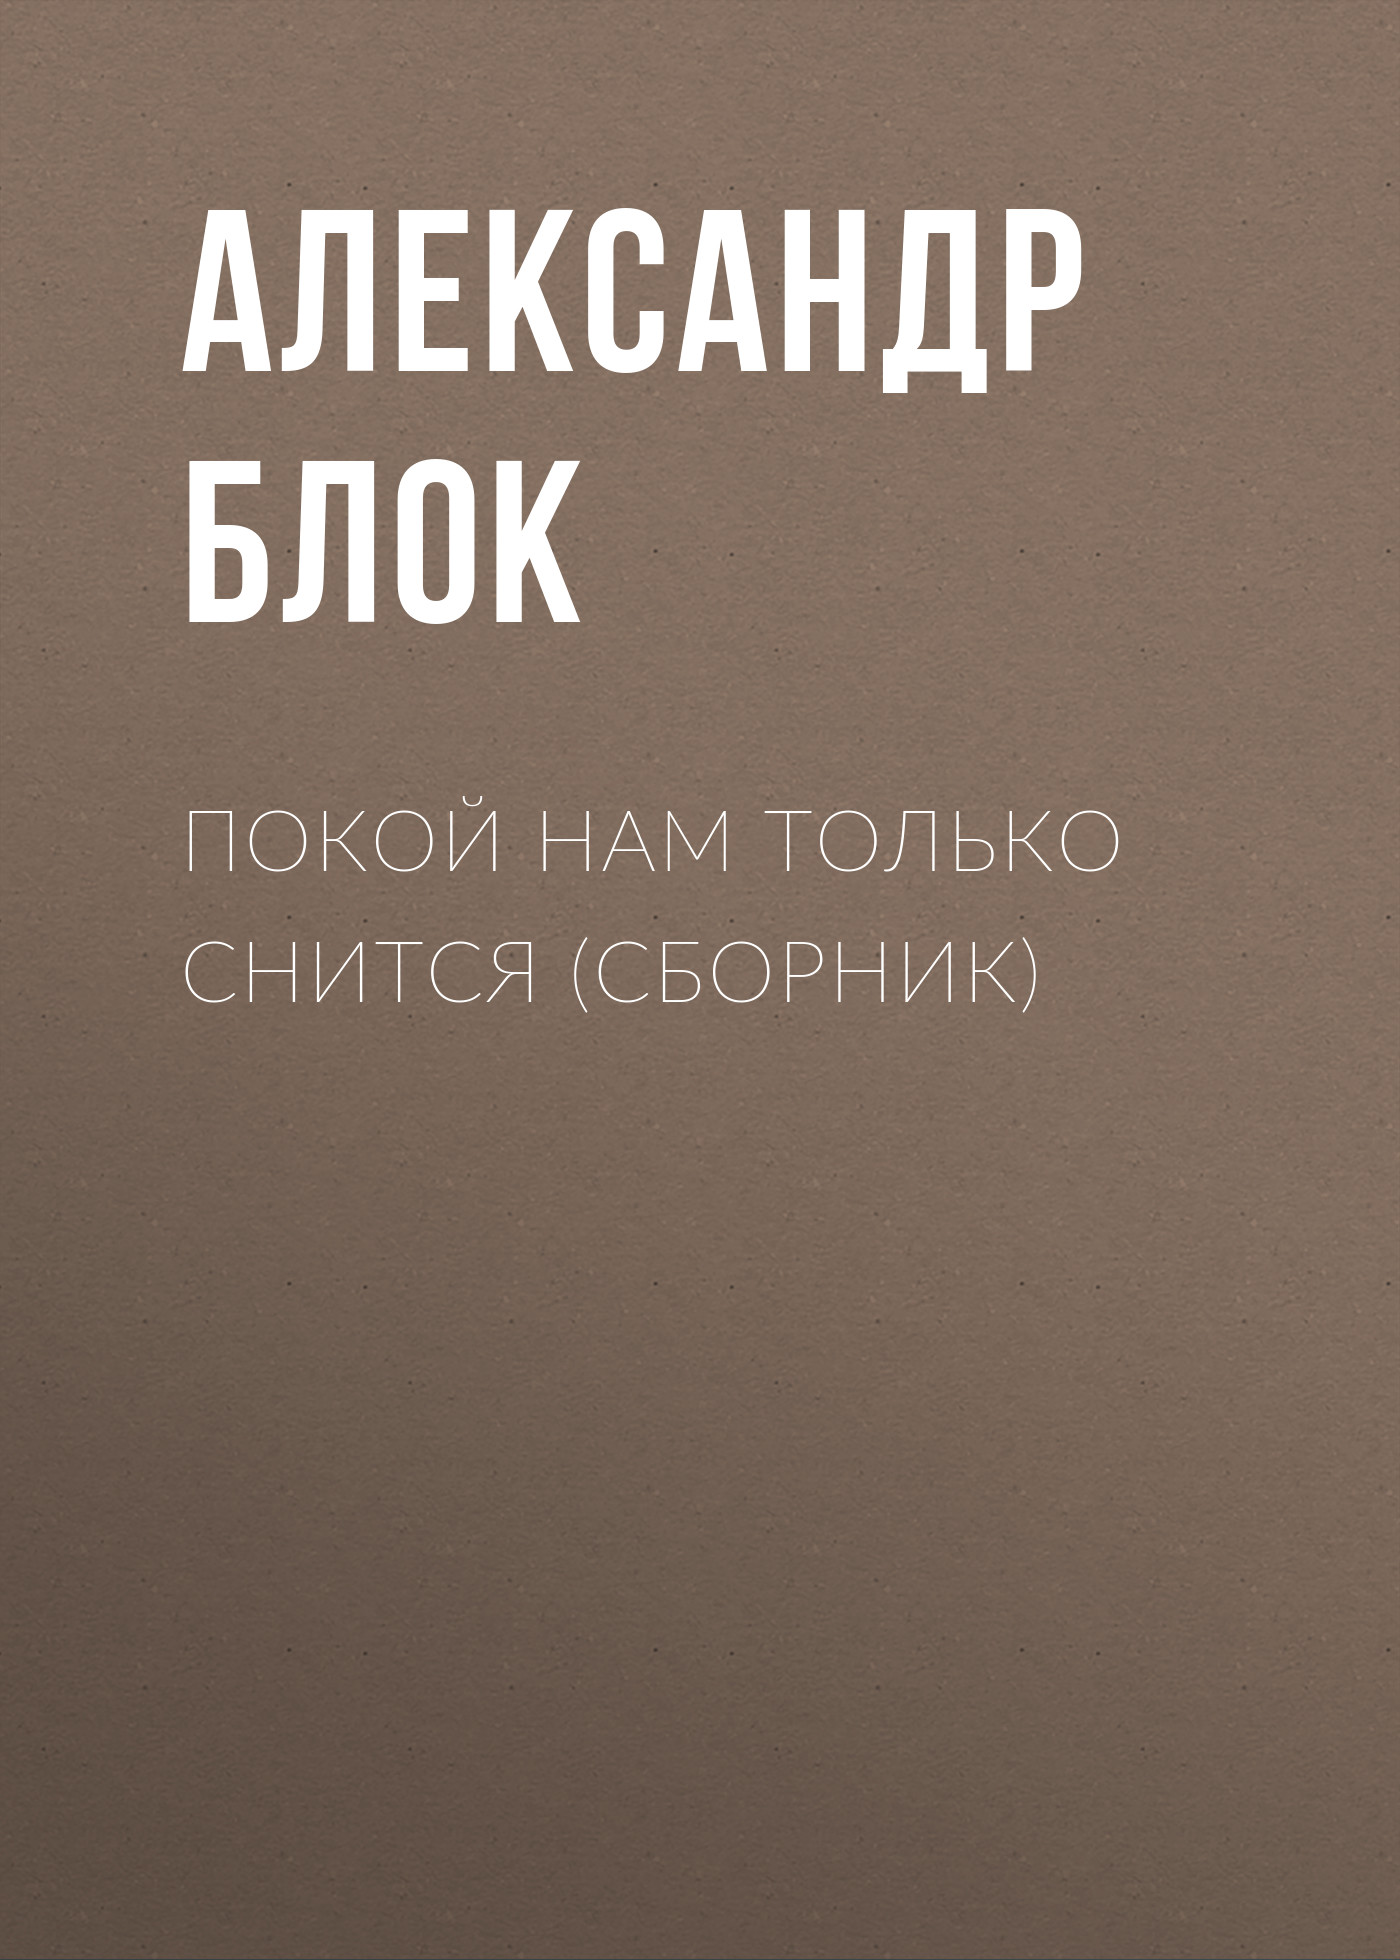 Александр Блок Покой нам только снится (сборник) александр блок балаганчик